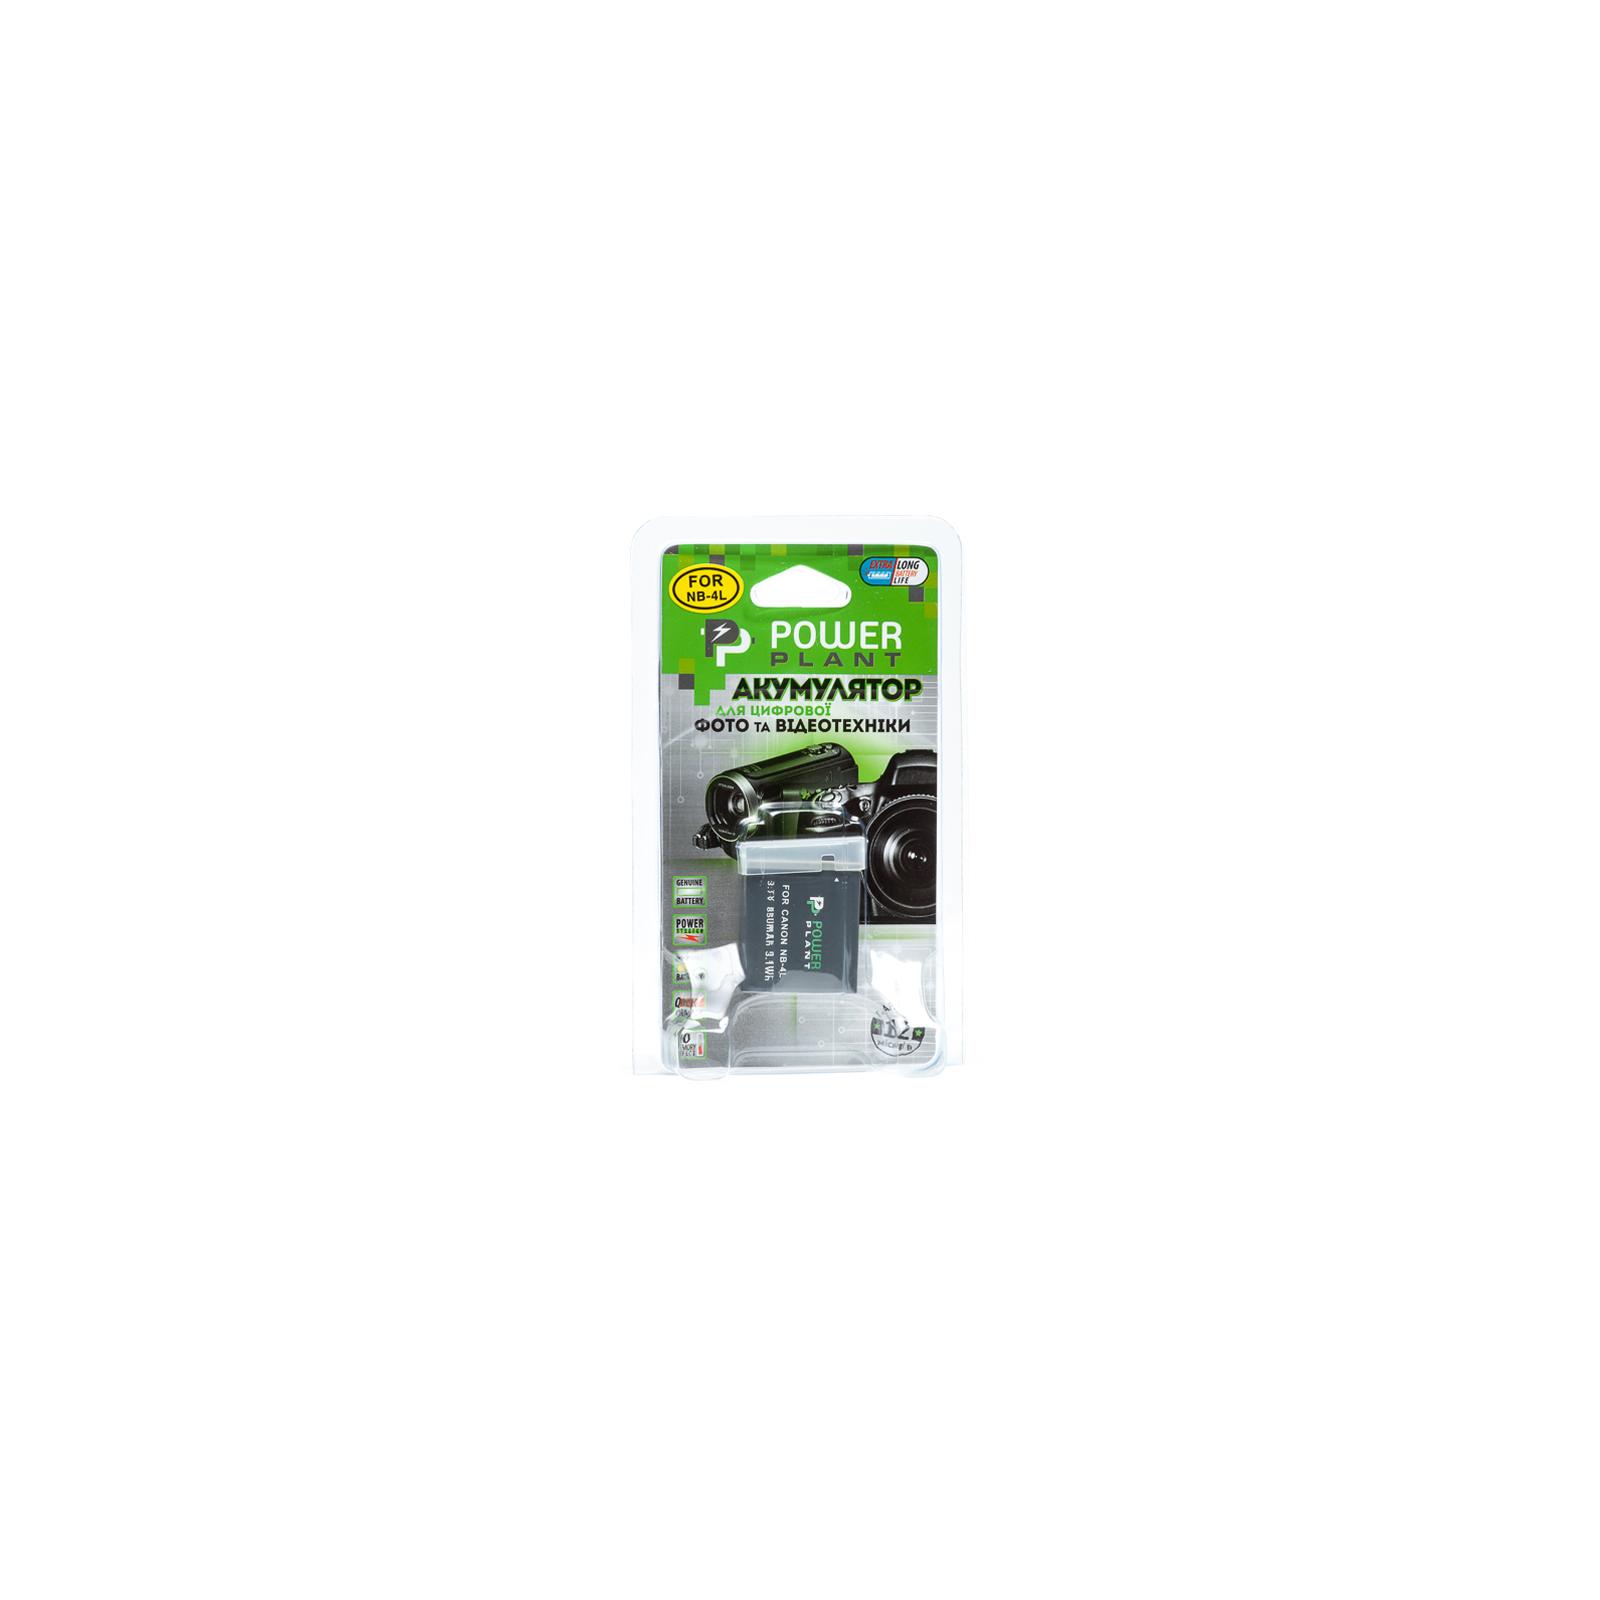 Аккумулятор к фото/видео PowerPlant Canon NB-4L (DV00DV1006) изображение 3